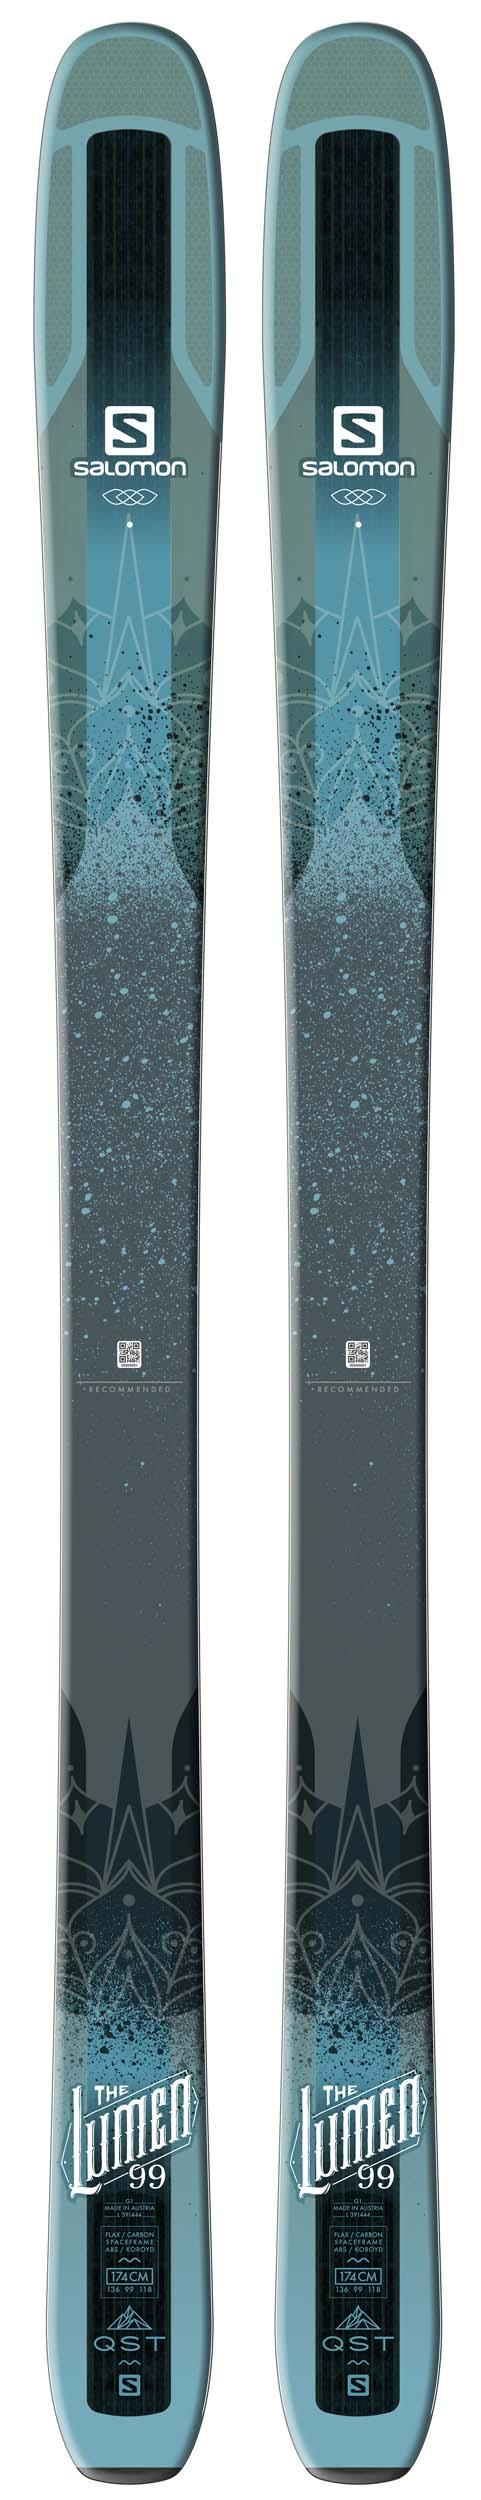 tout neuf def72 7a58b Salomon 2018 QST Lumen 99 Skis (Without Bindings / Flat) NEW !! 153cm